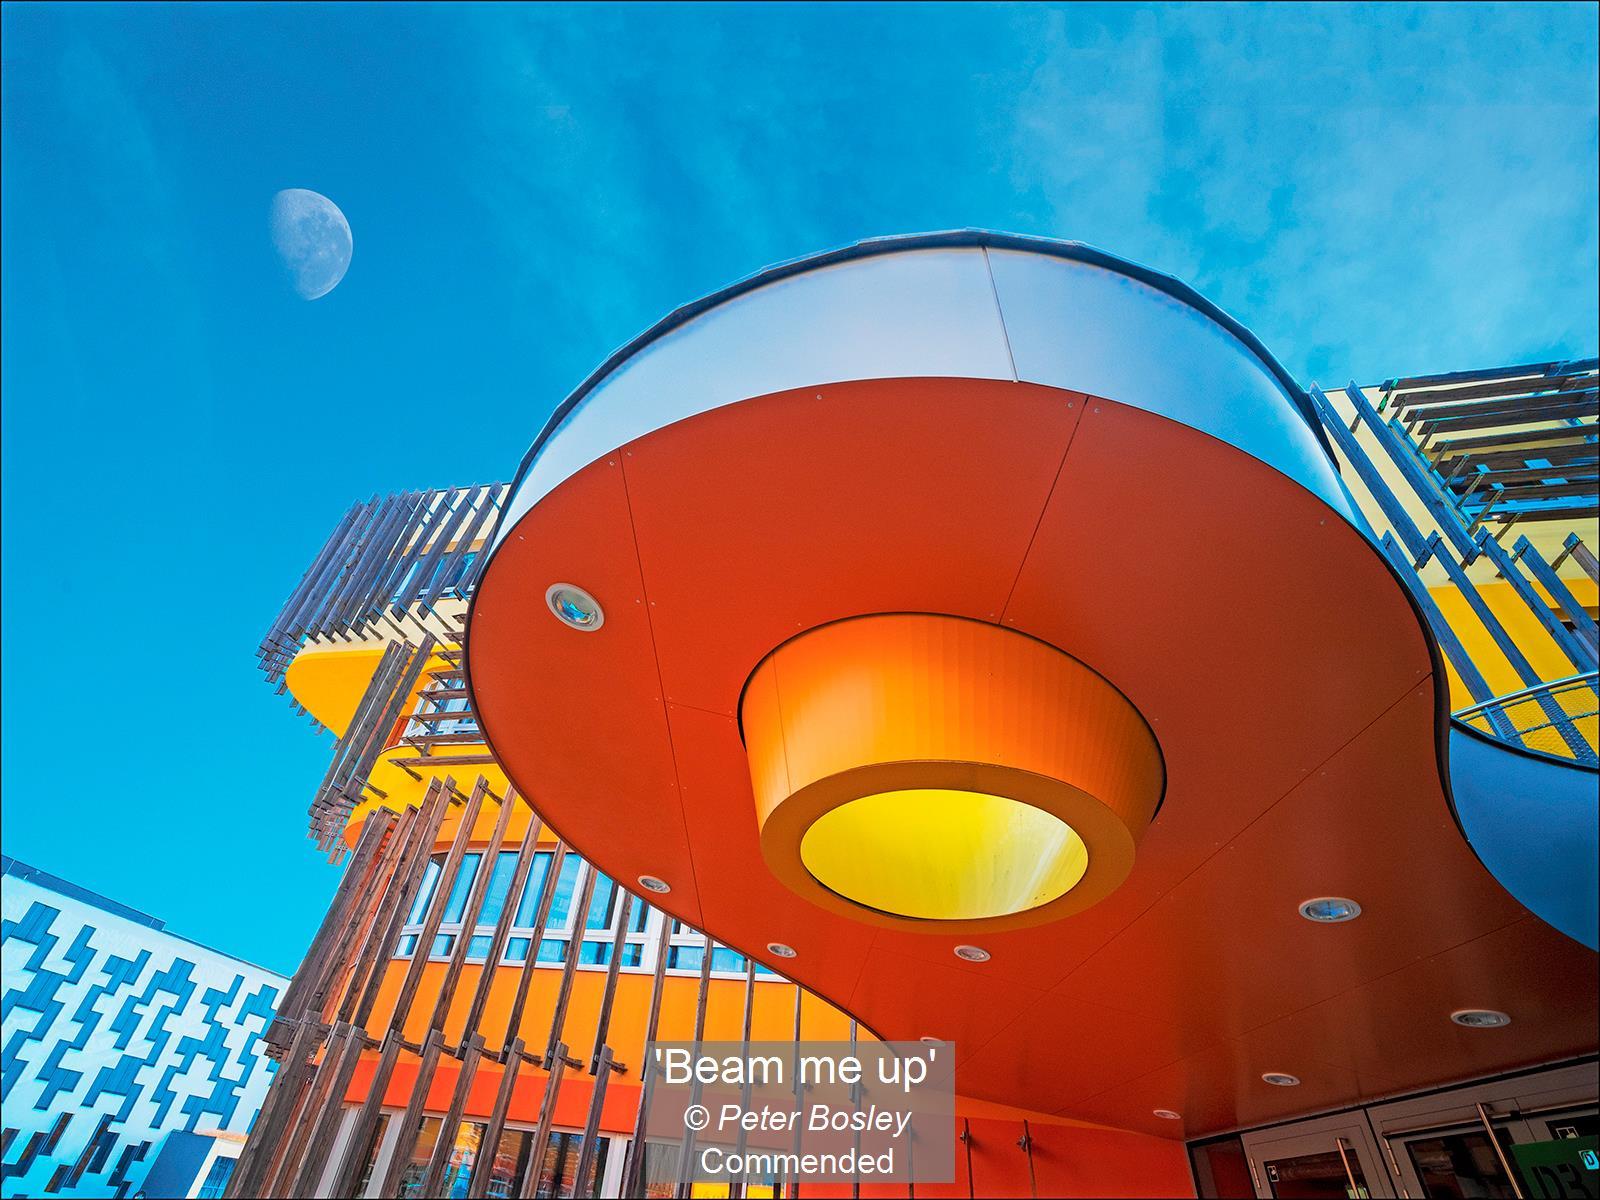 'Beam me up'_Peter Bosley_Comm